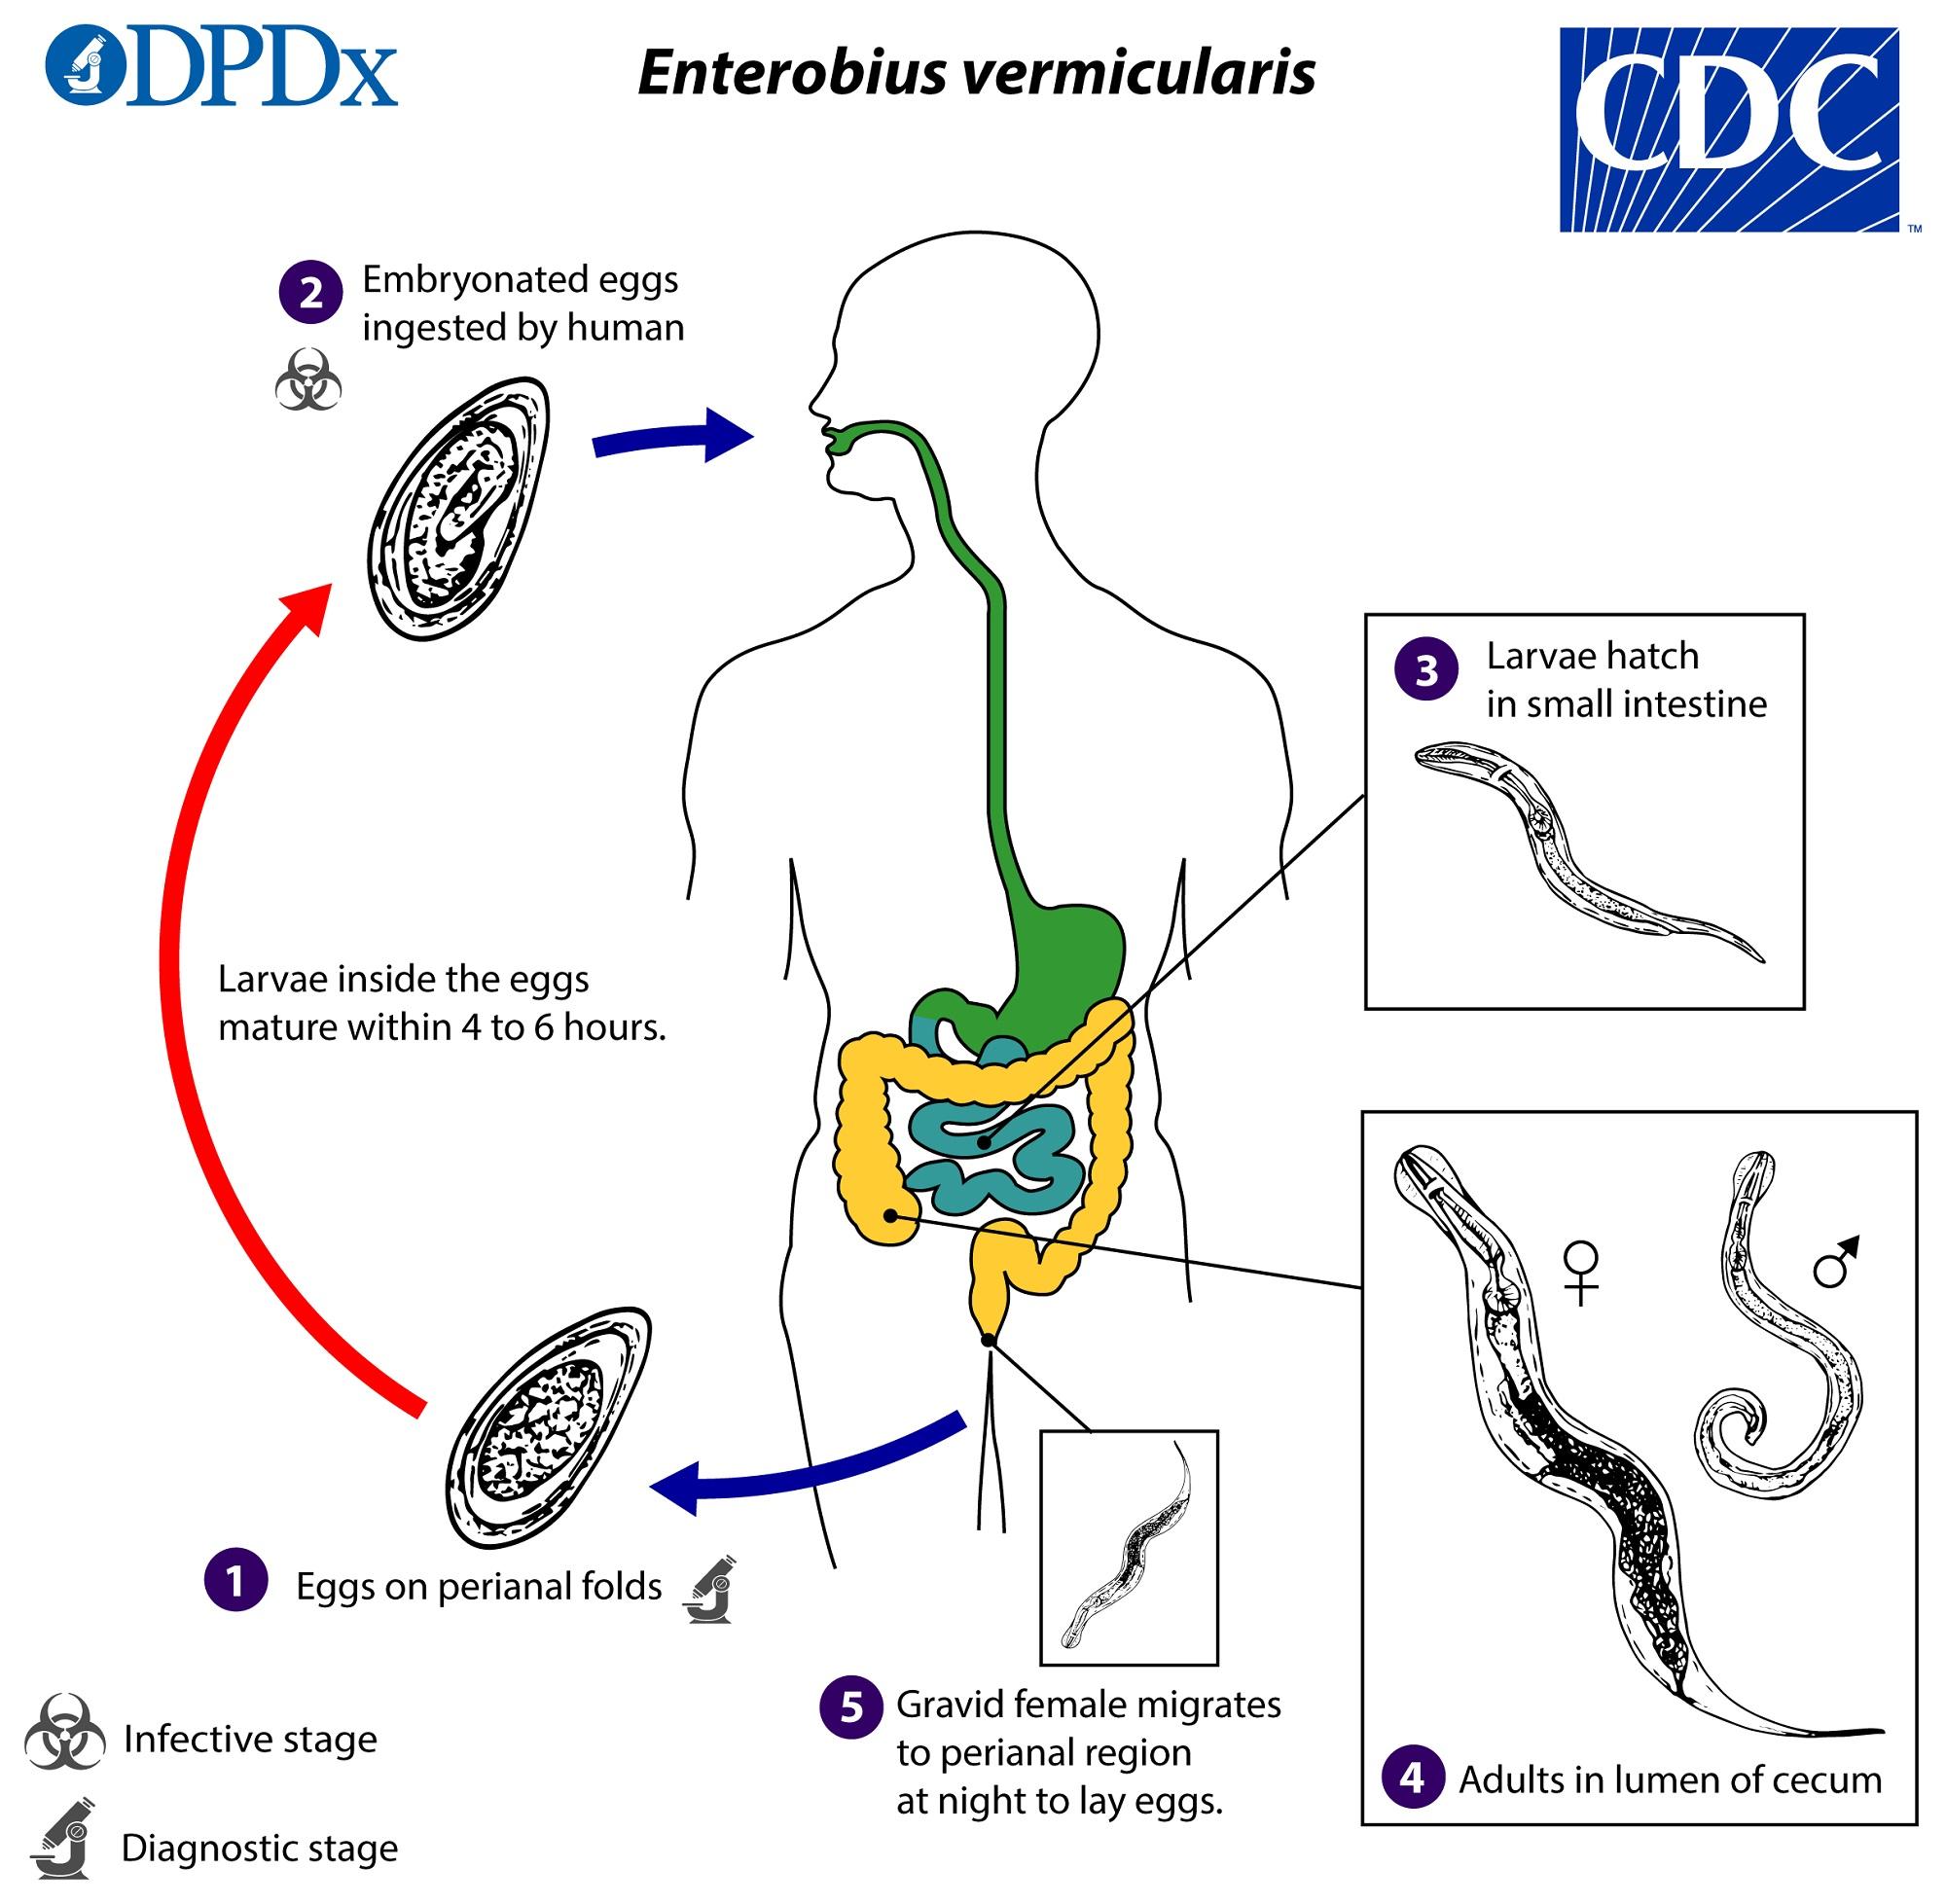 enterobius vermicularis vagyis